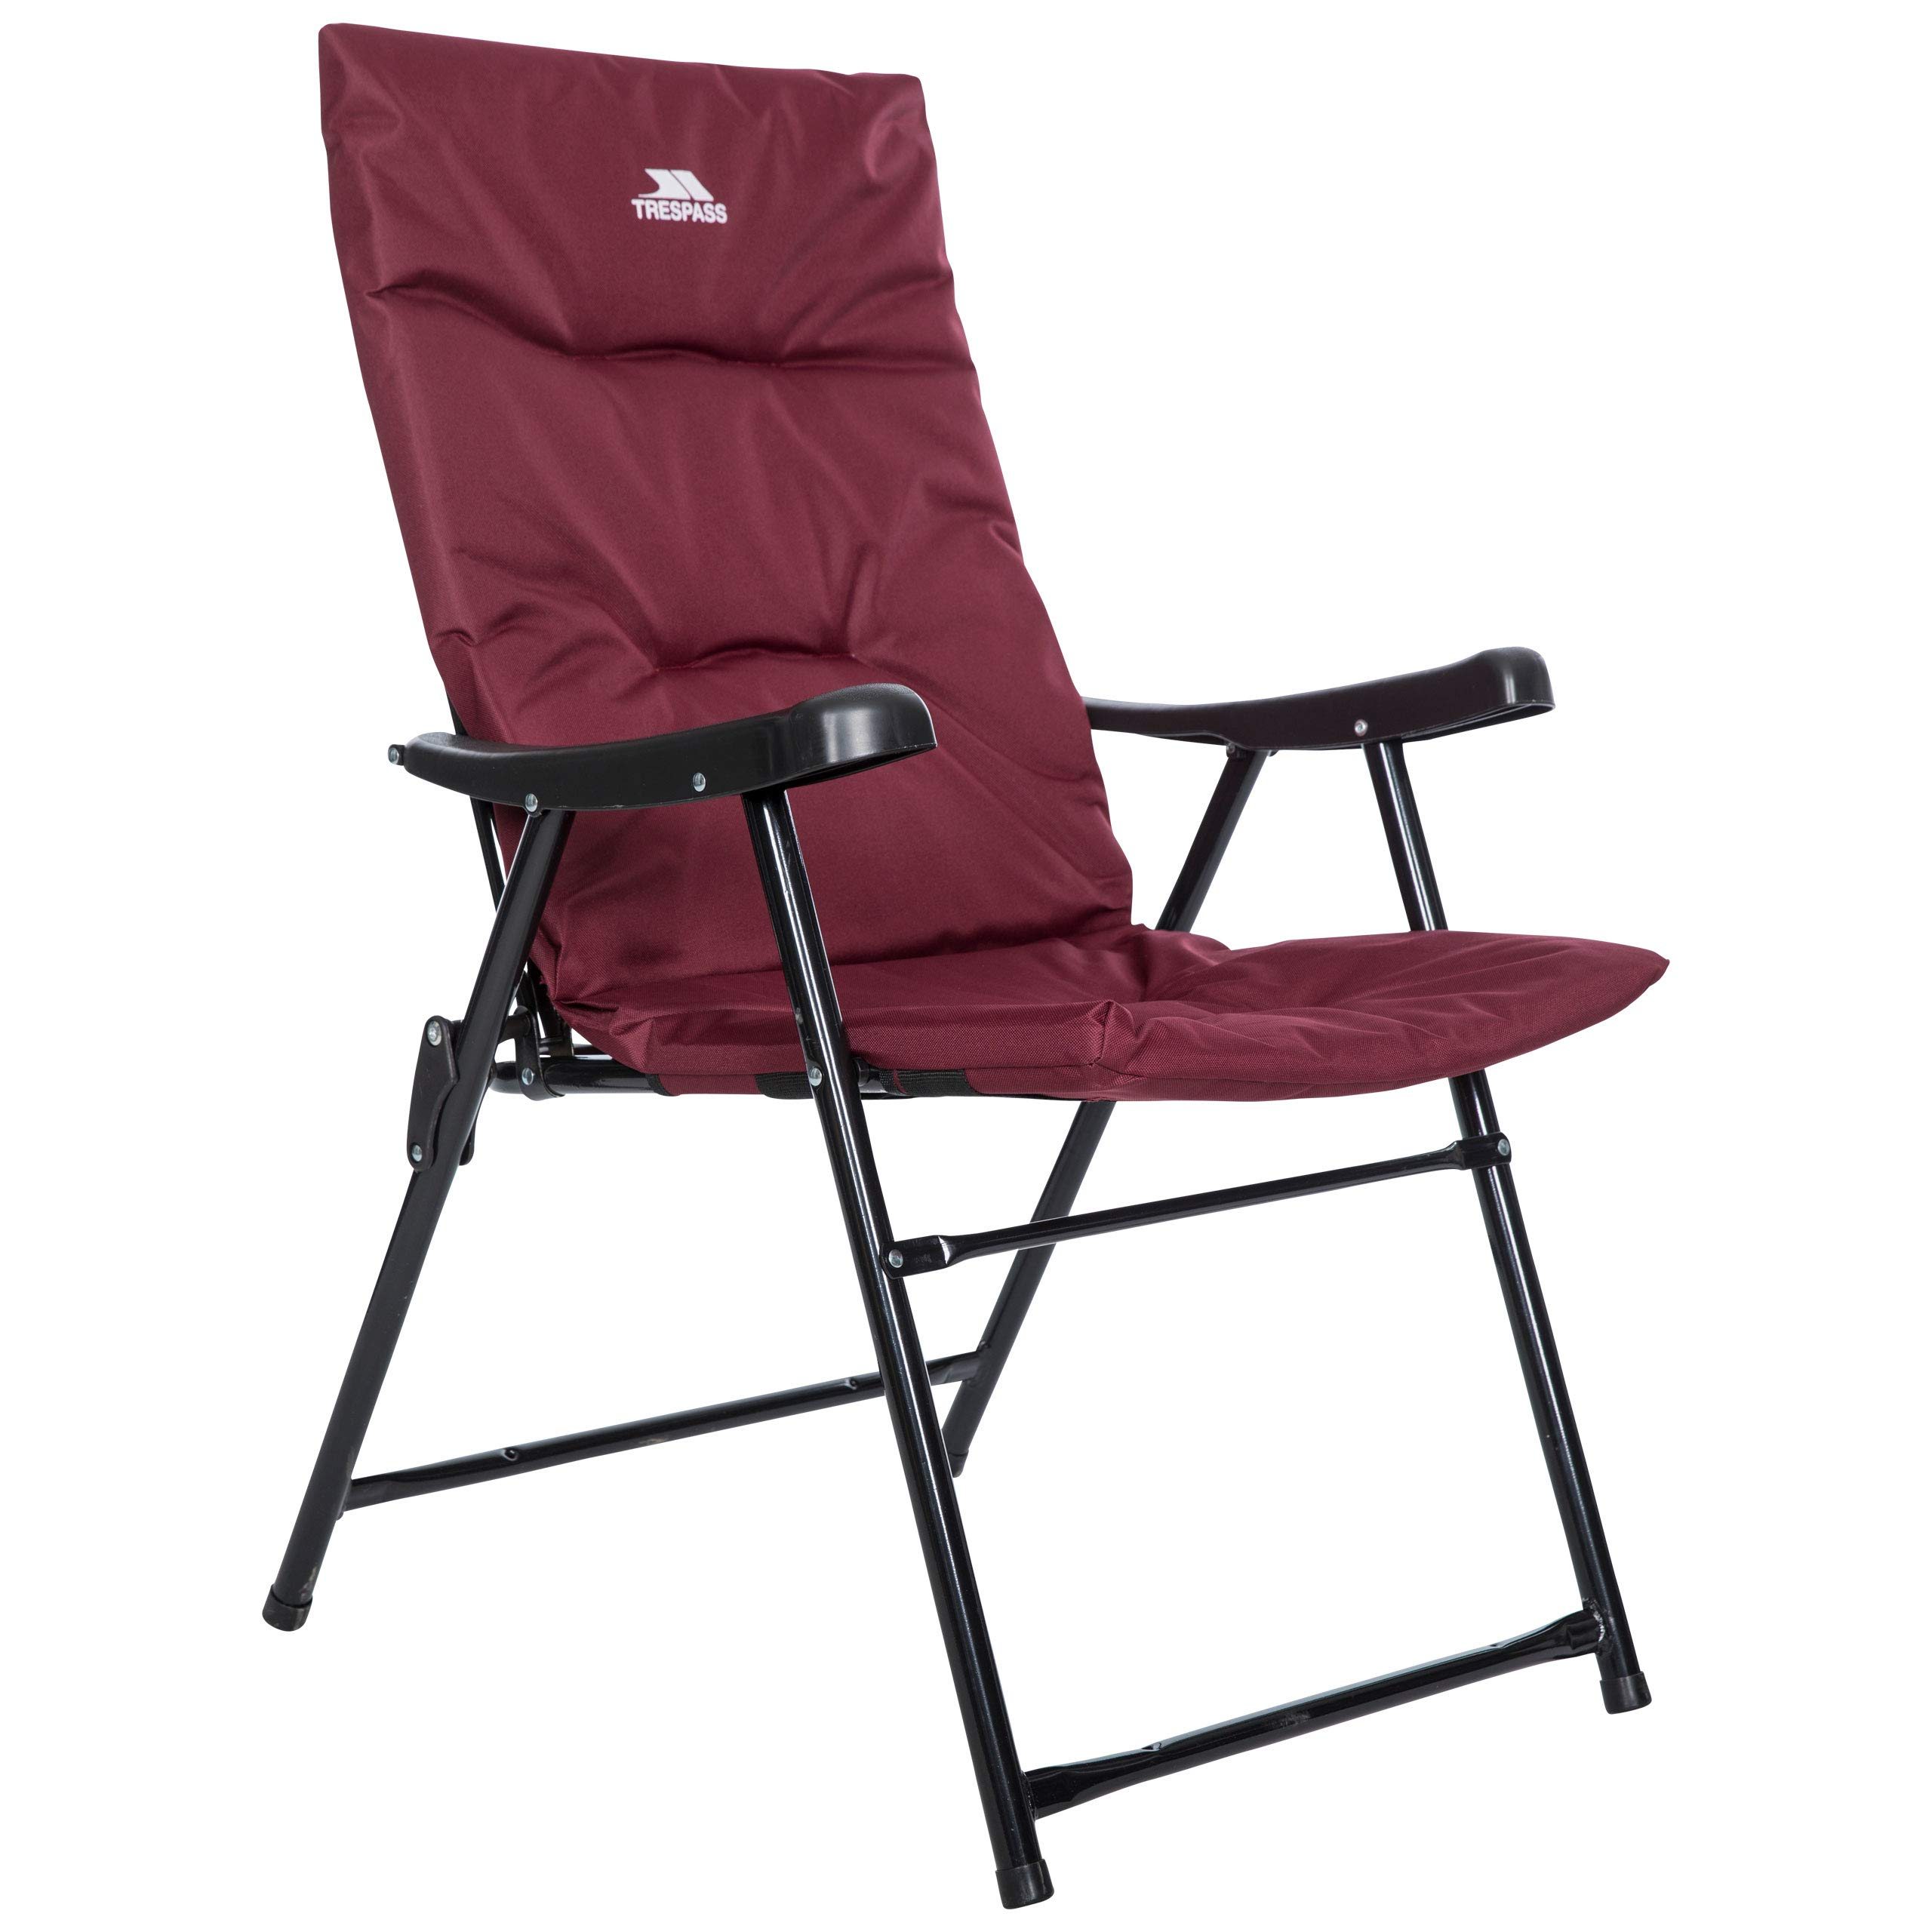 Granate. Trespass Paddy Silla plegable acolchada para acampada o jard/ín